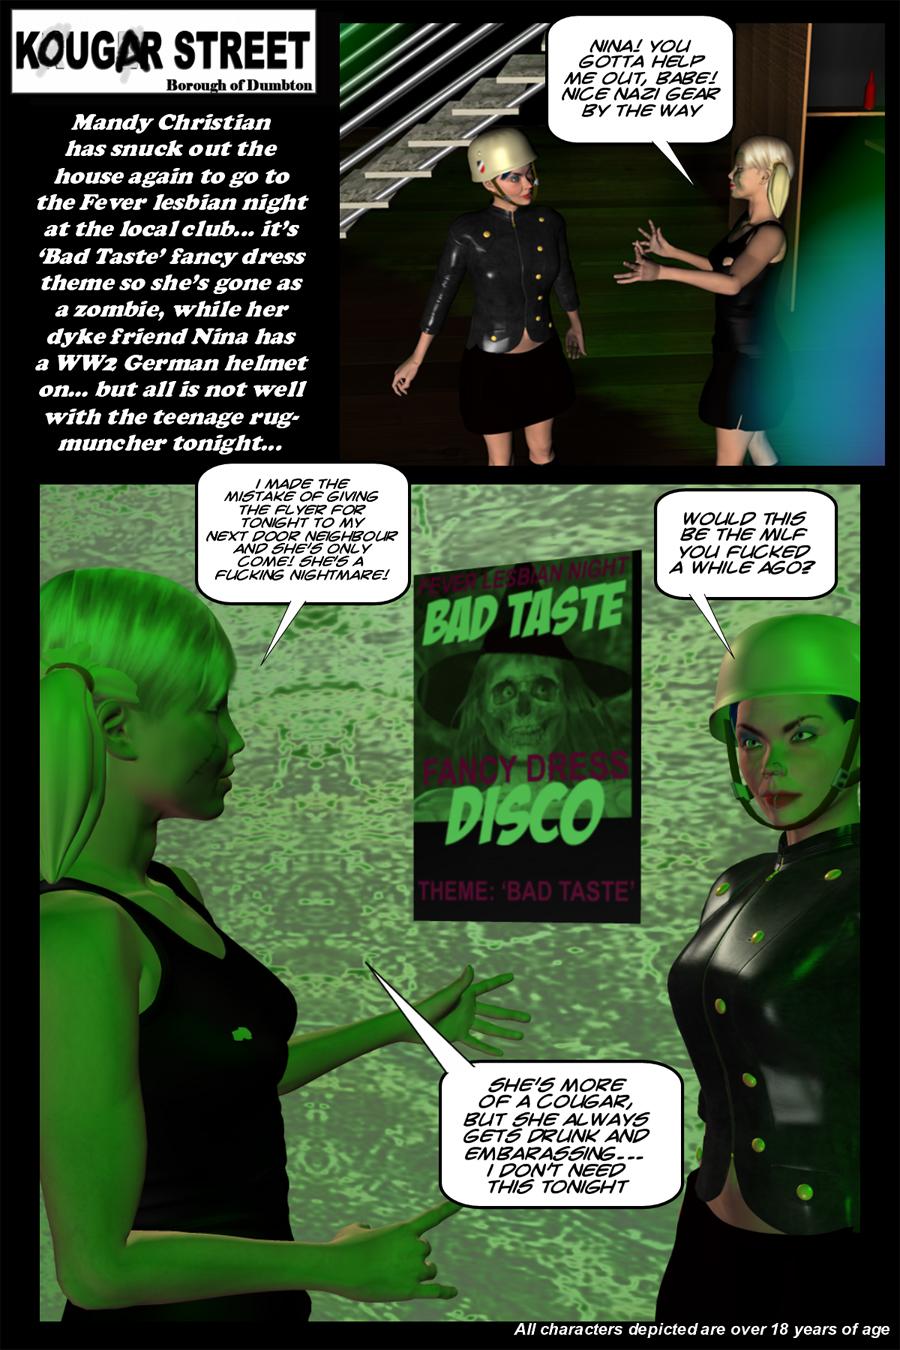 Bad Taste Disco